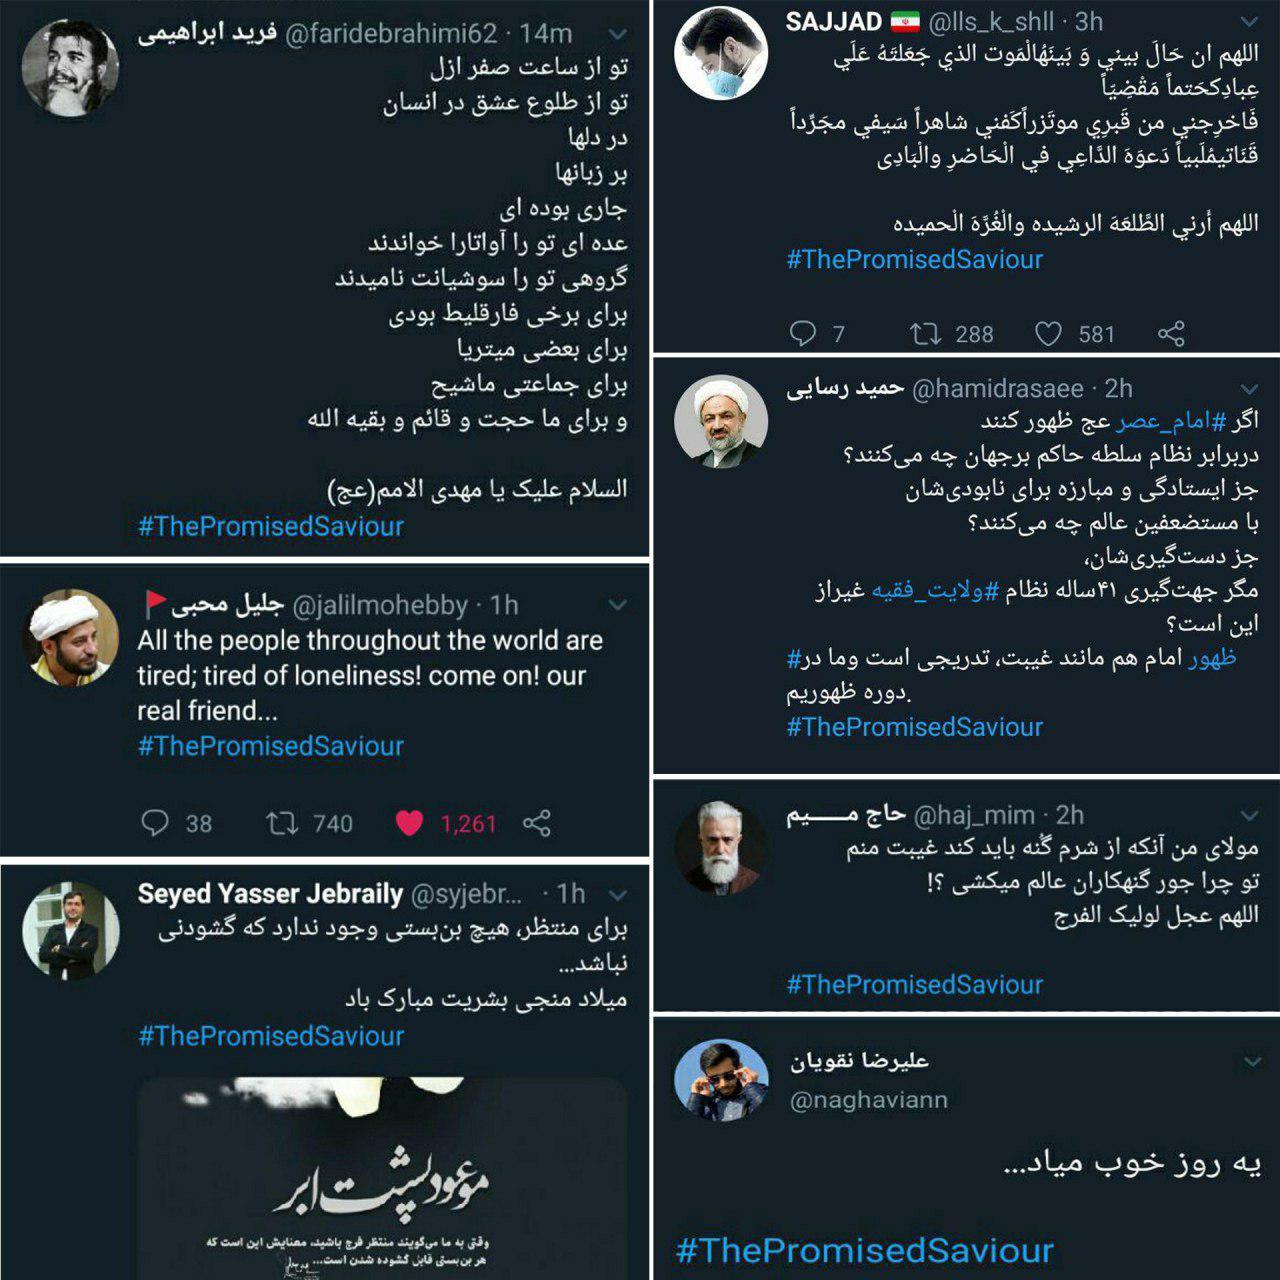 توییت اشخاص مشهور - 7